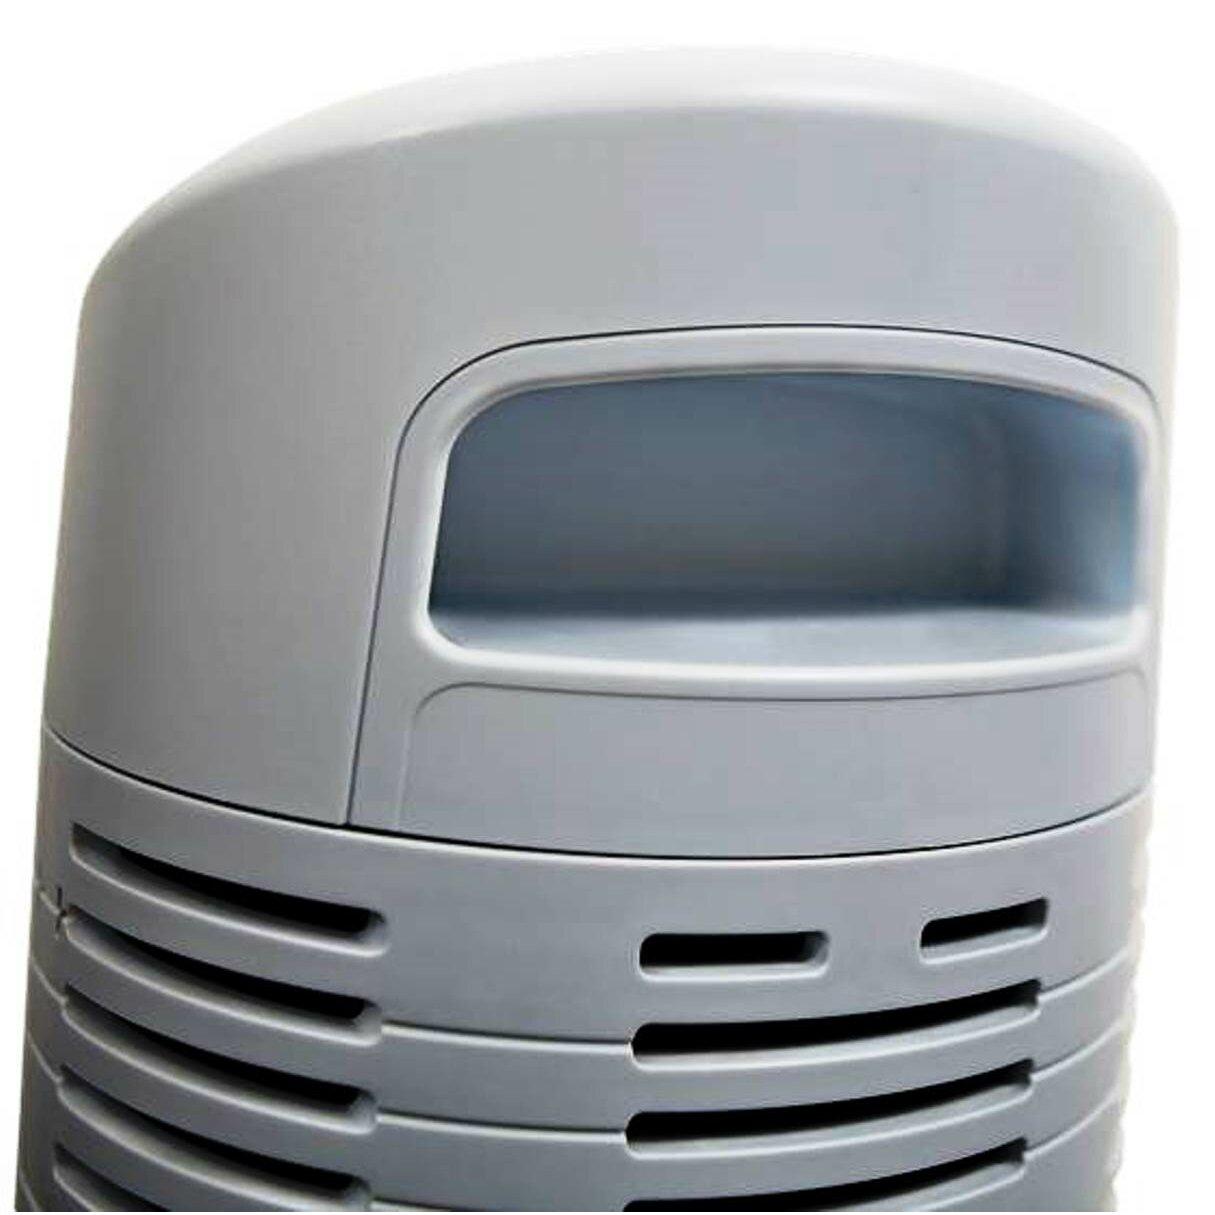 Lifesmart Ezcool Duo Port Air Cooler Amp Reviews Wayfair